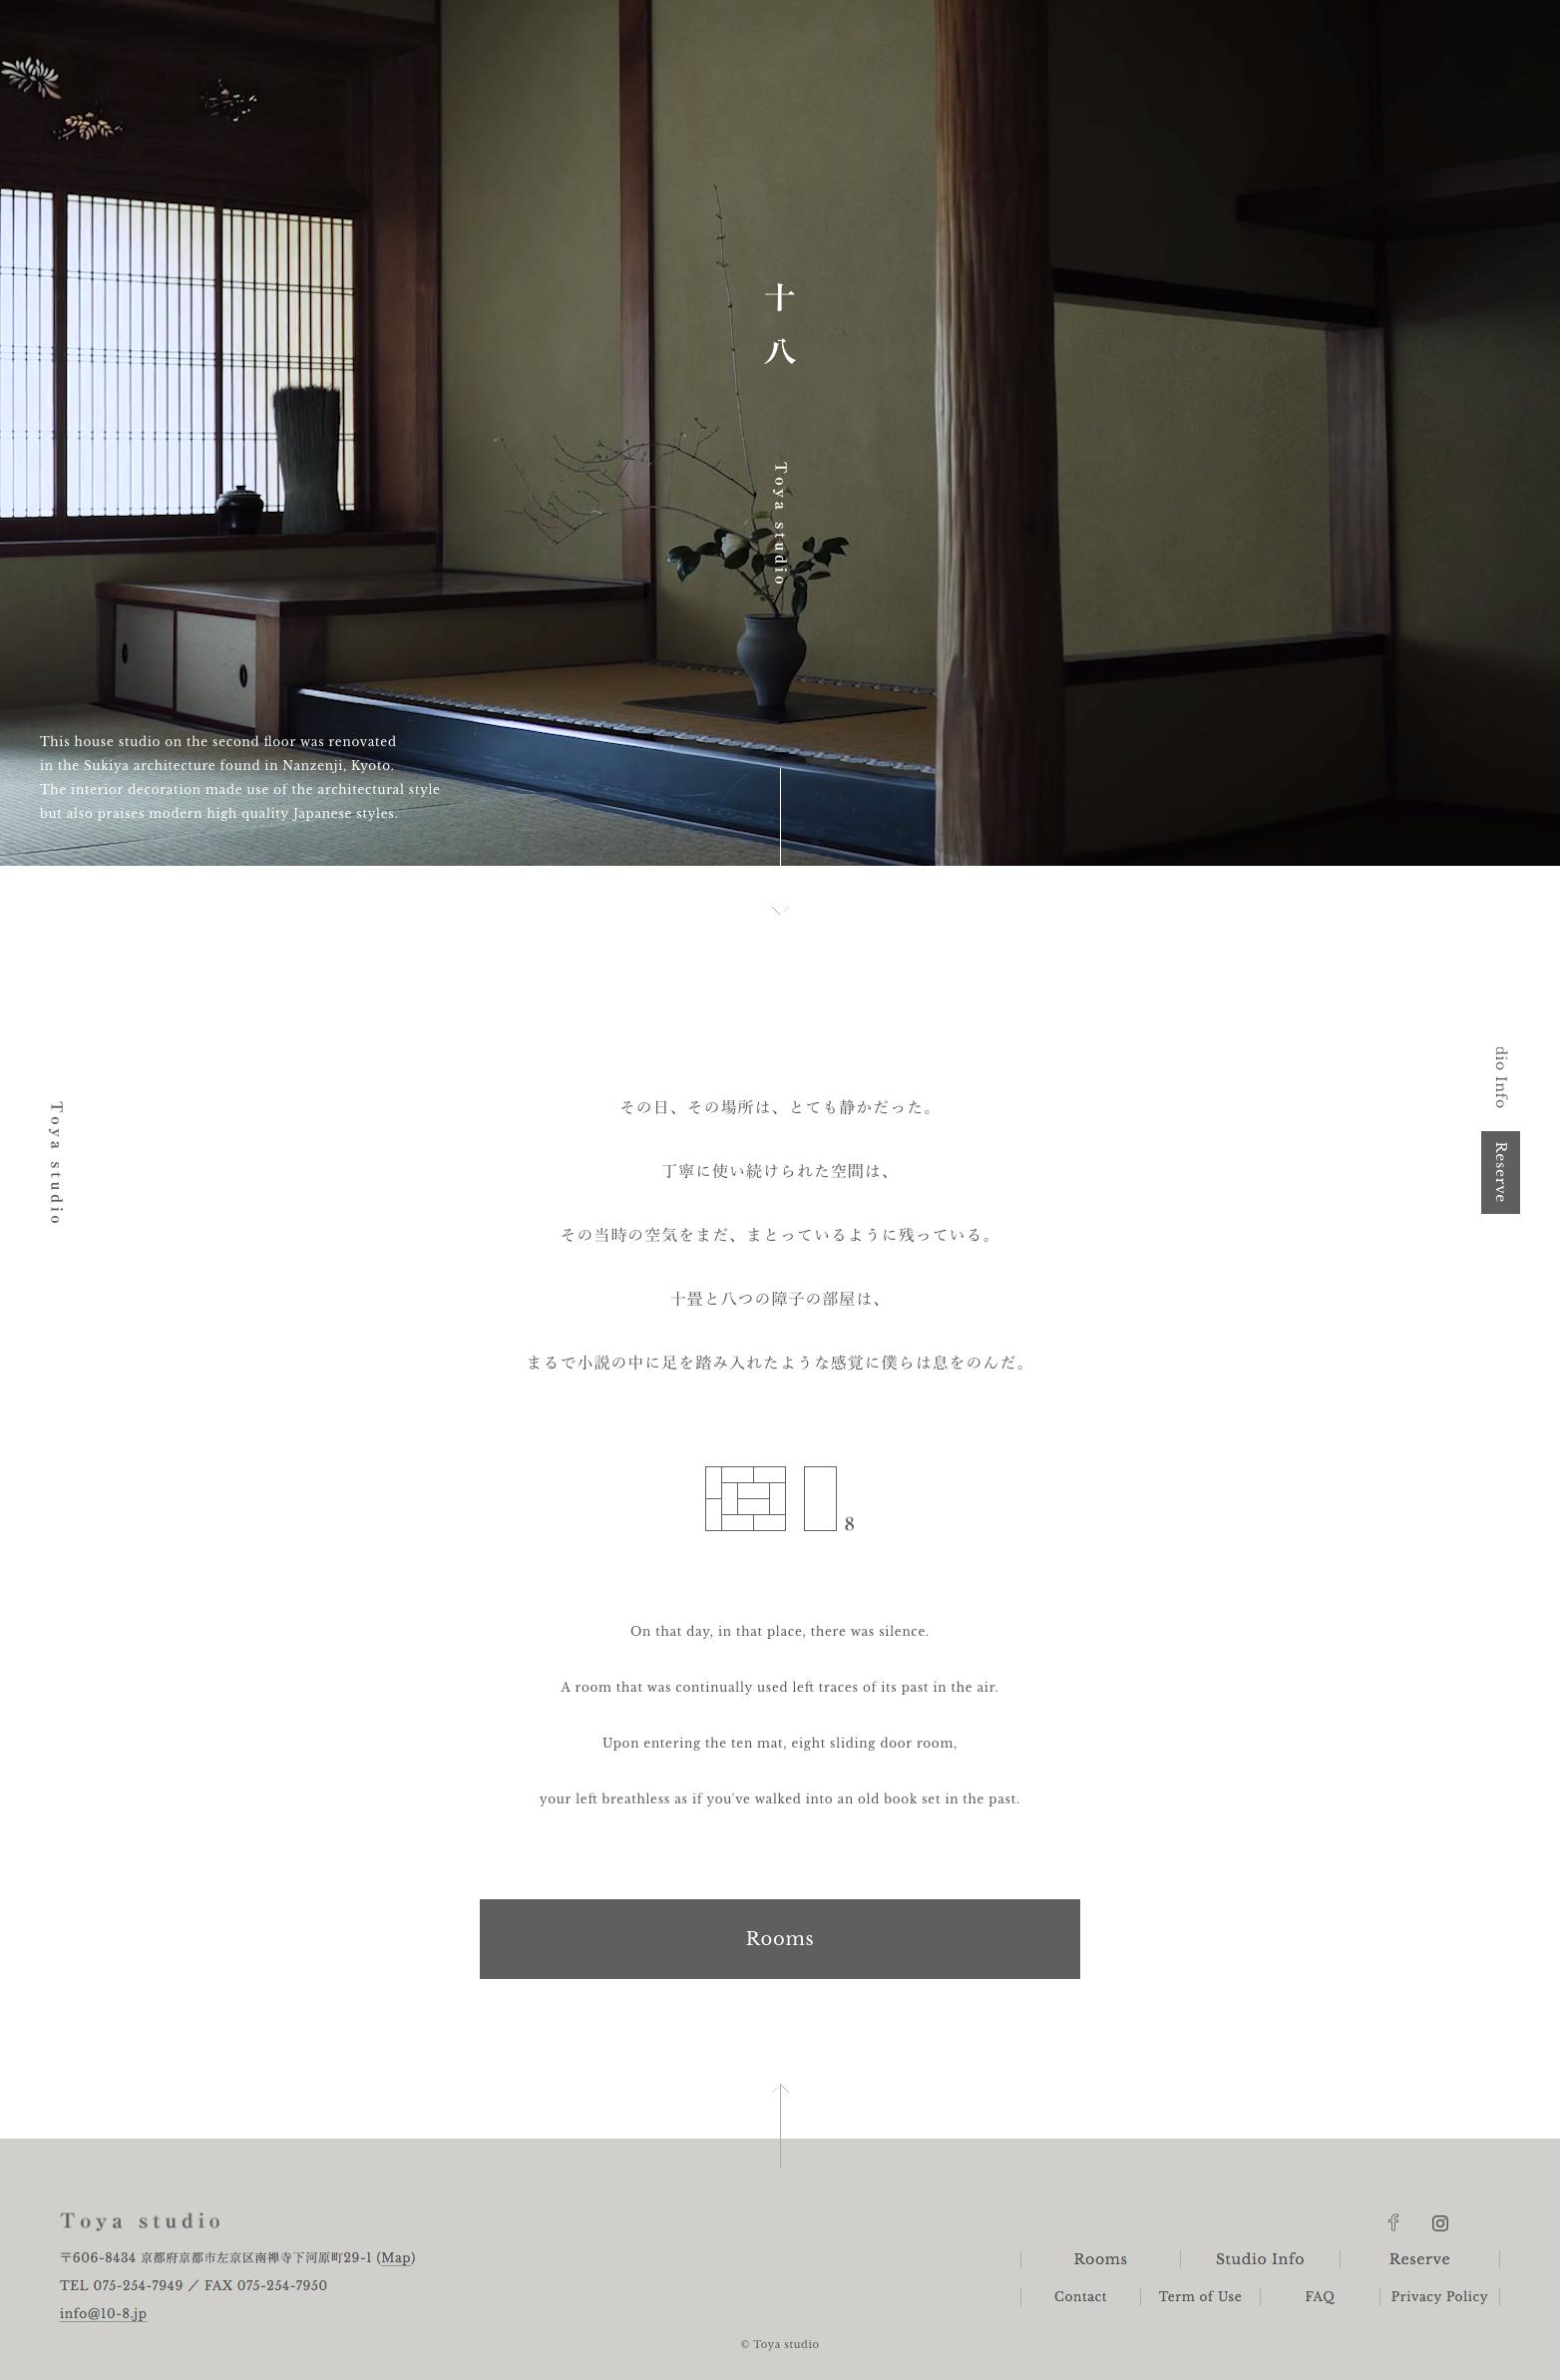 screencapture-10-8-jp-1504761298661.png